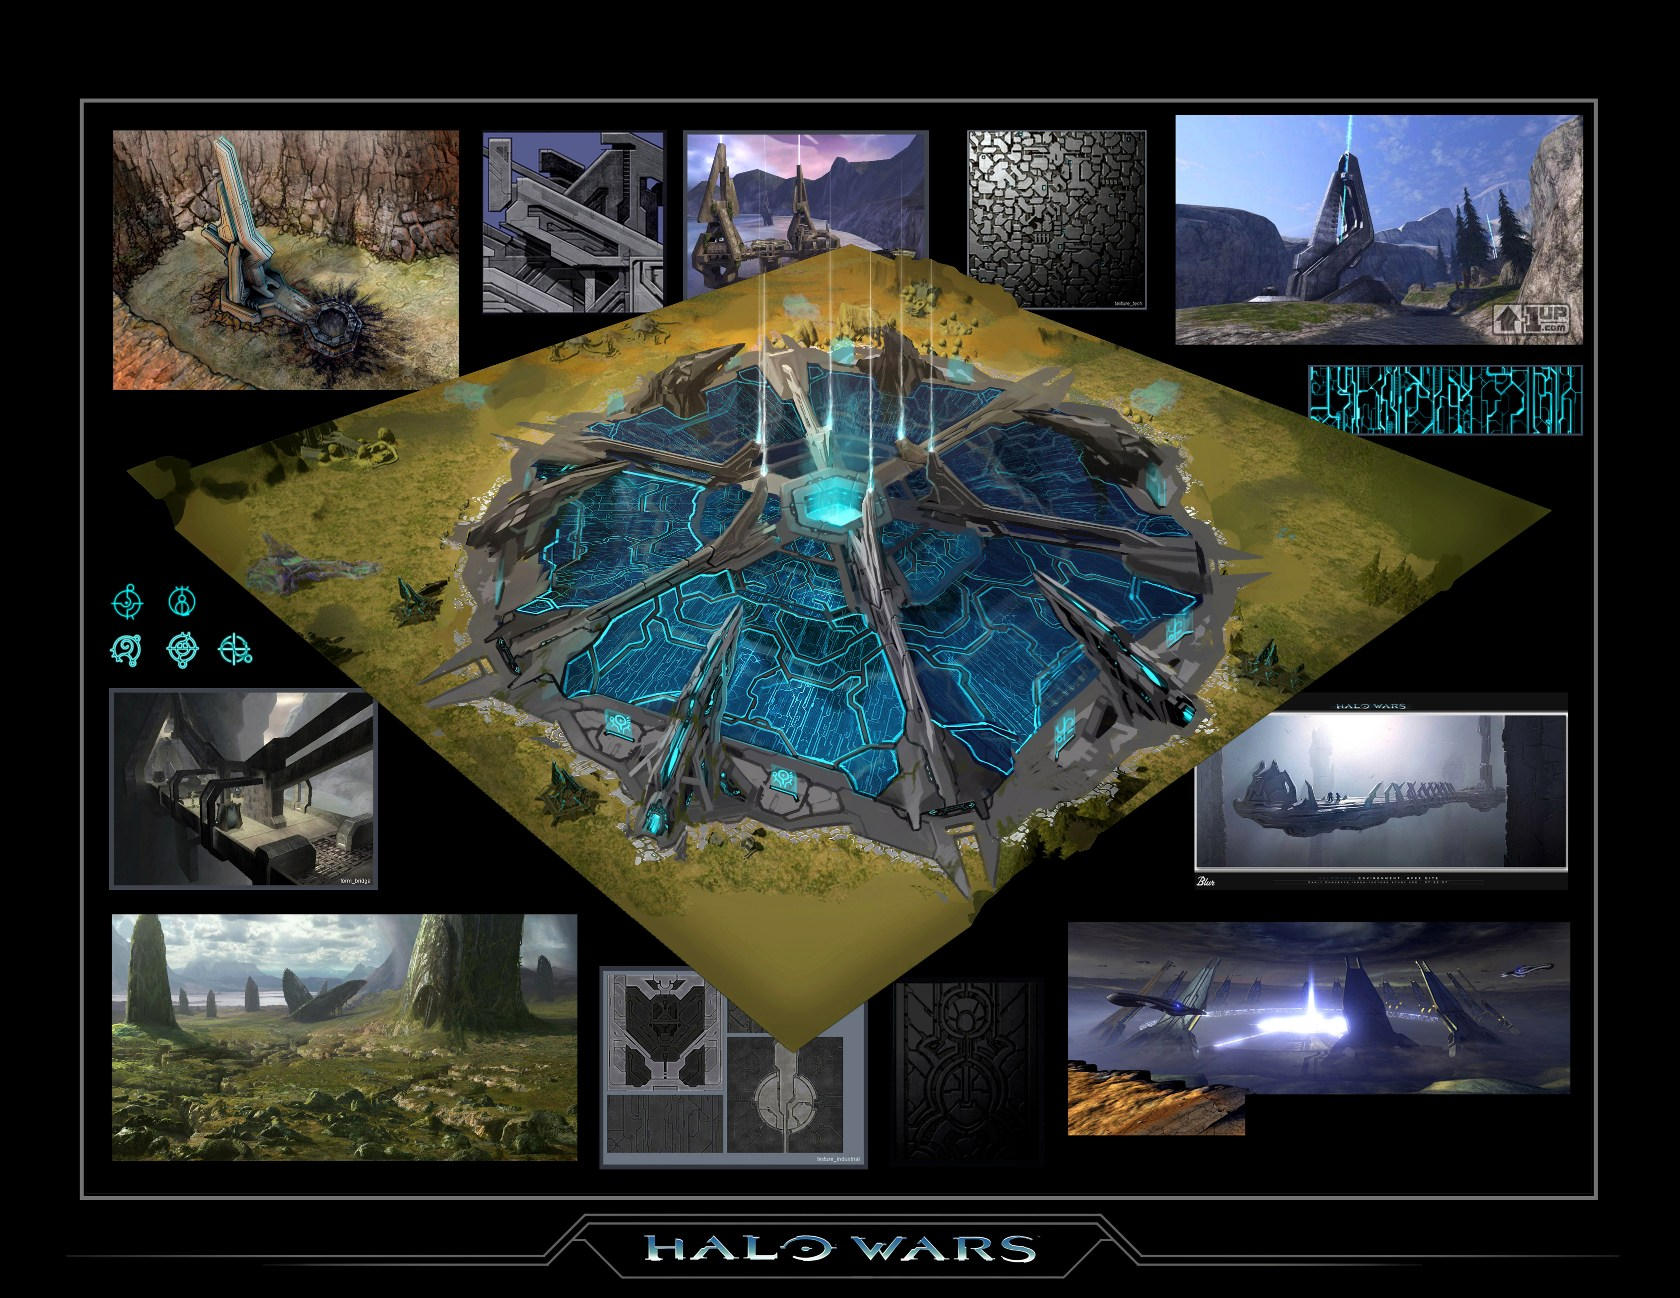 Joe Gillum talks Halo Wars single player campaign design | Remember